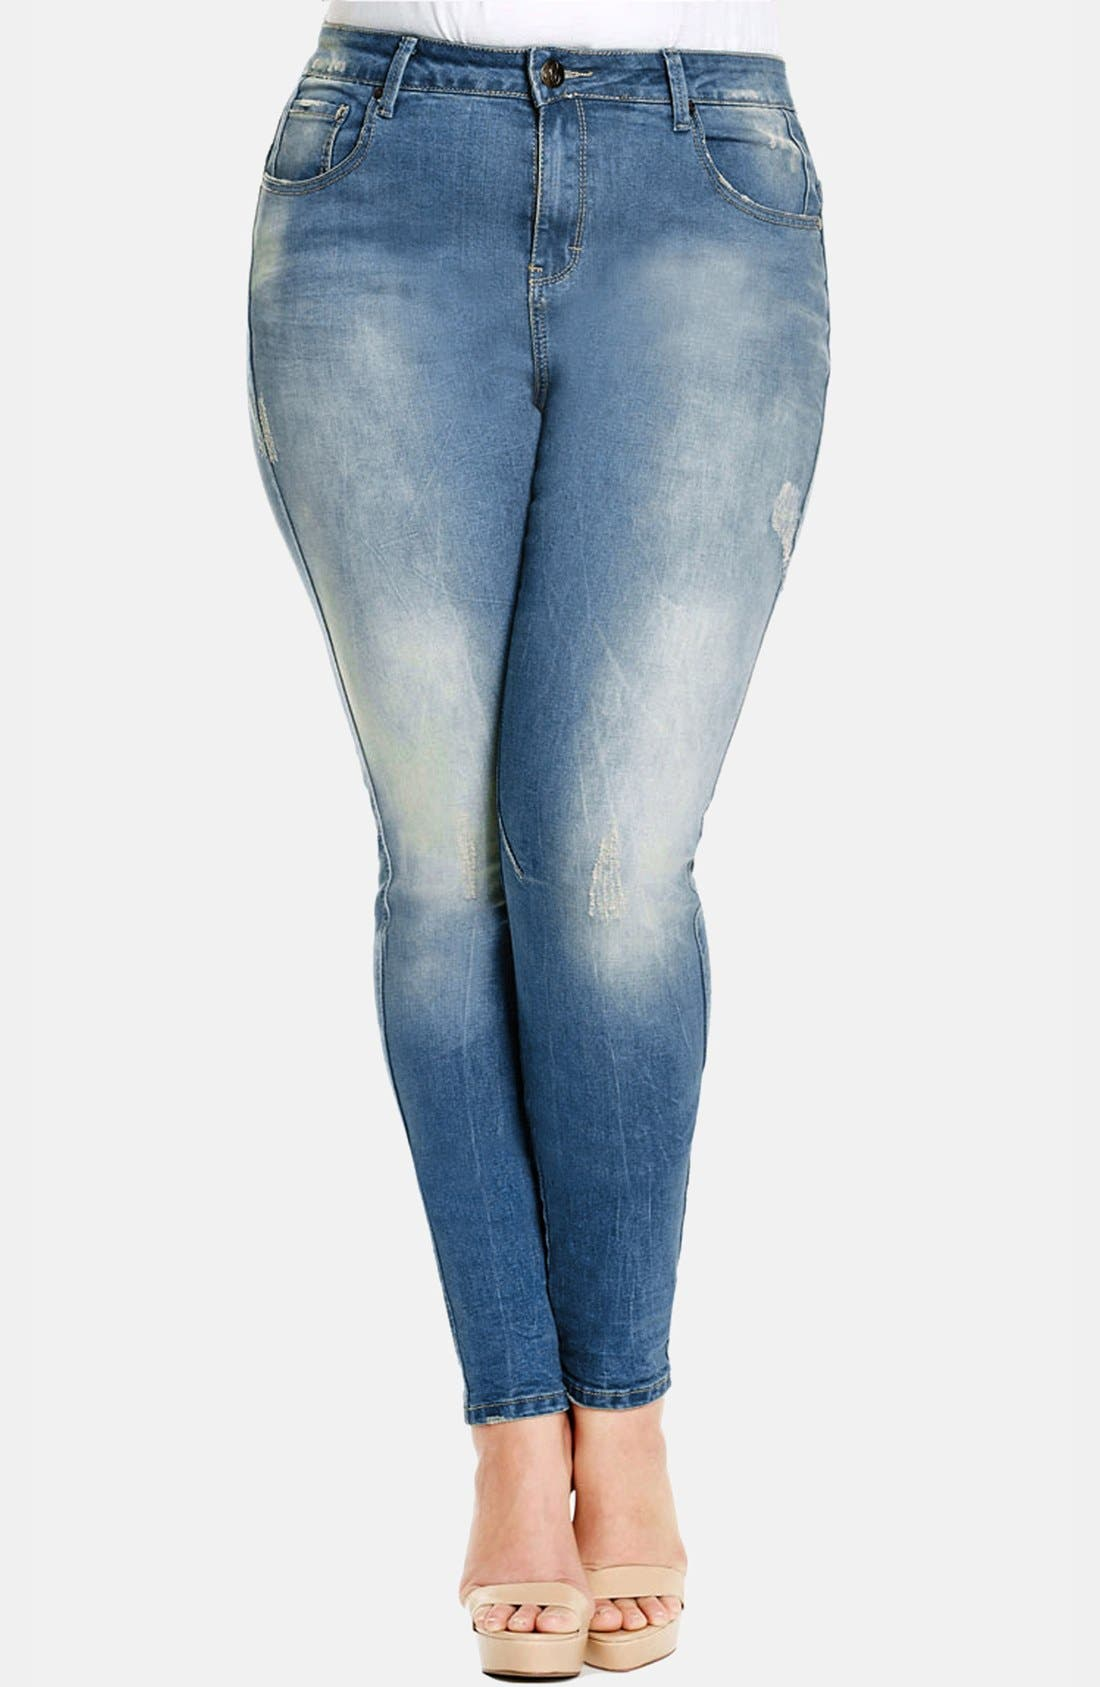 Main Image - City Chic Destructed Stretch Skinny Jeans (Light Denim) (Plus Size)